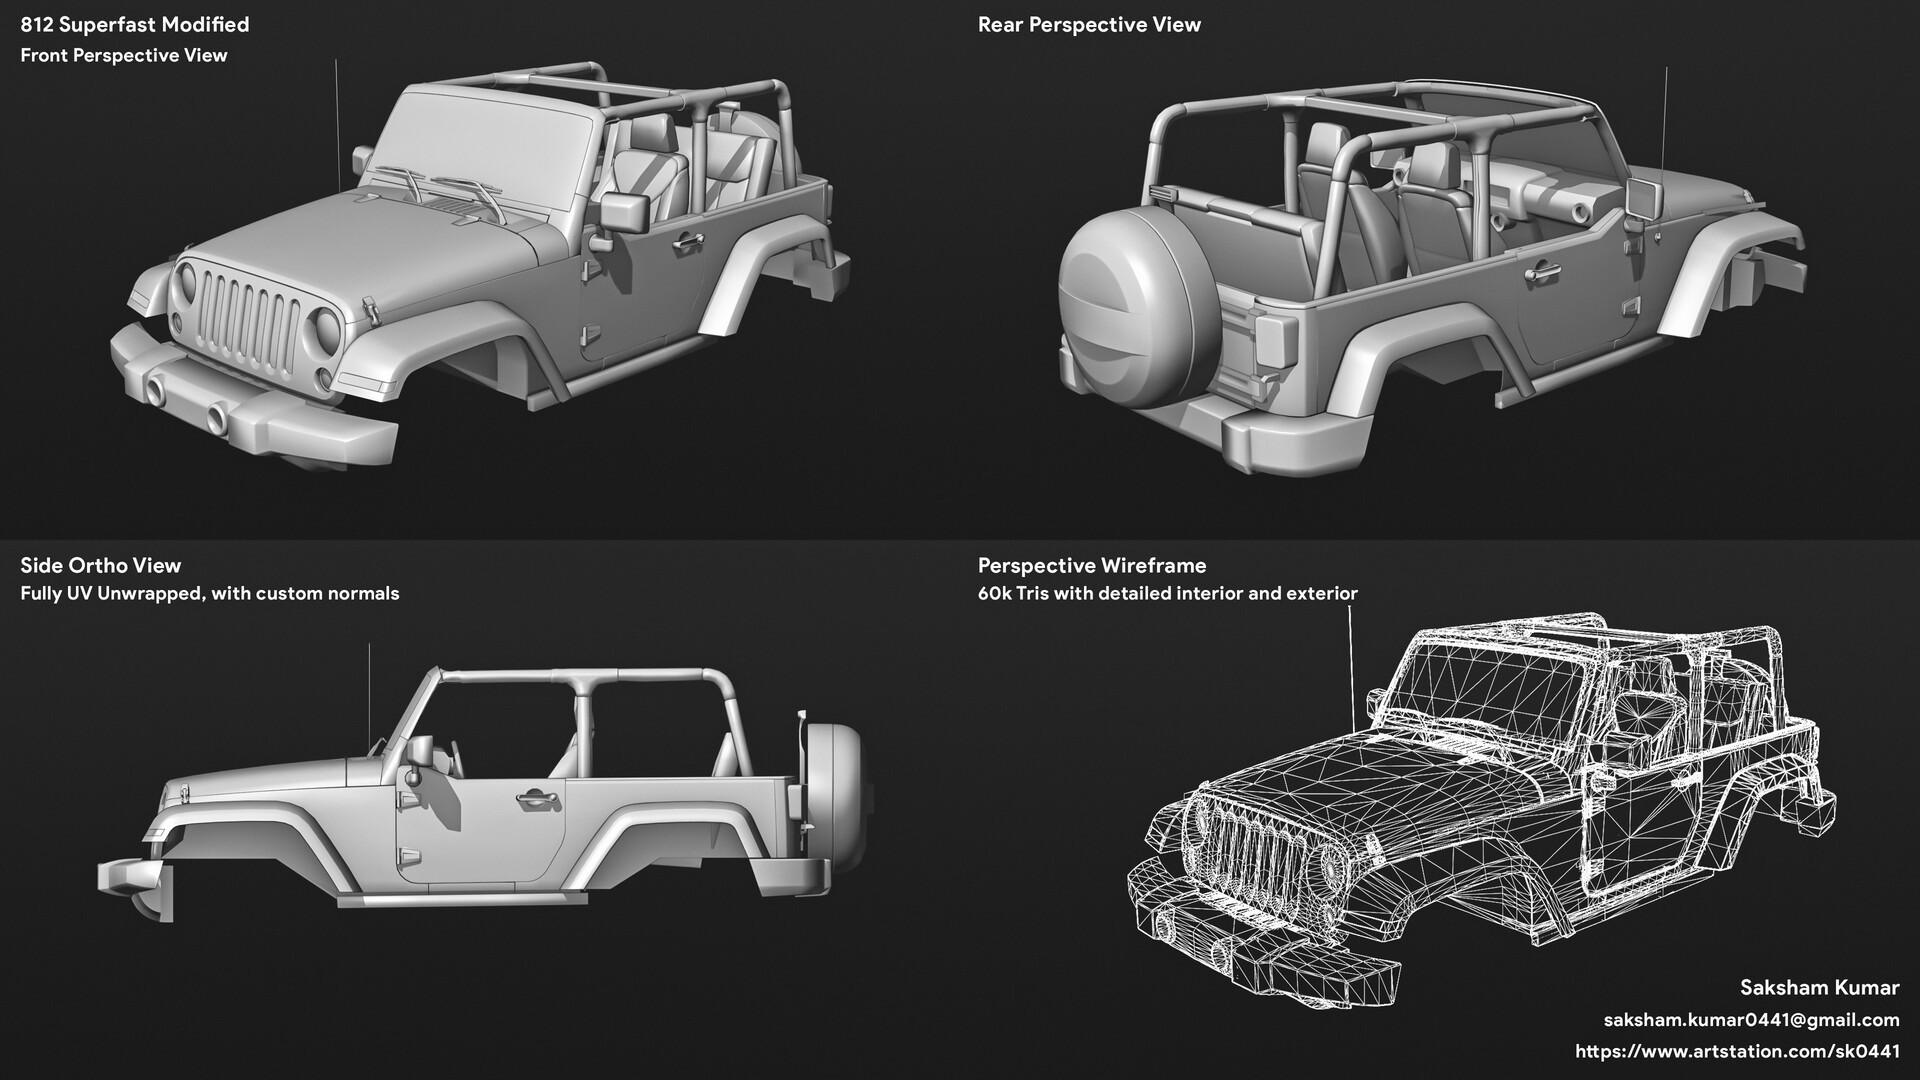 Jeep Wrangler with detailed interior (60k tris)